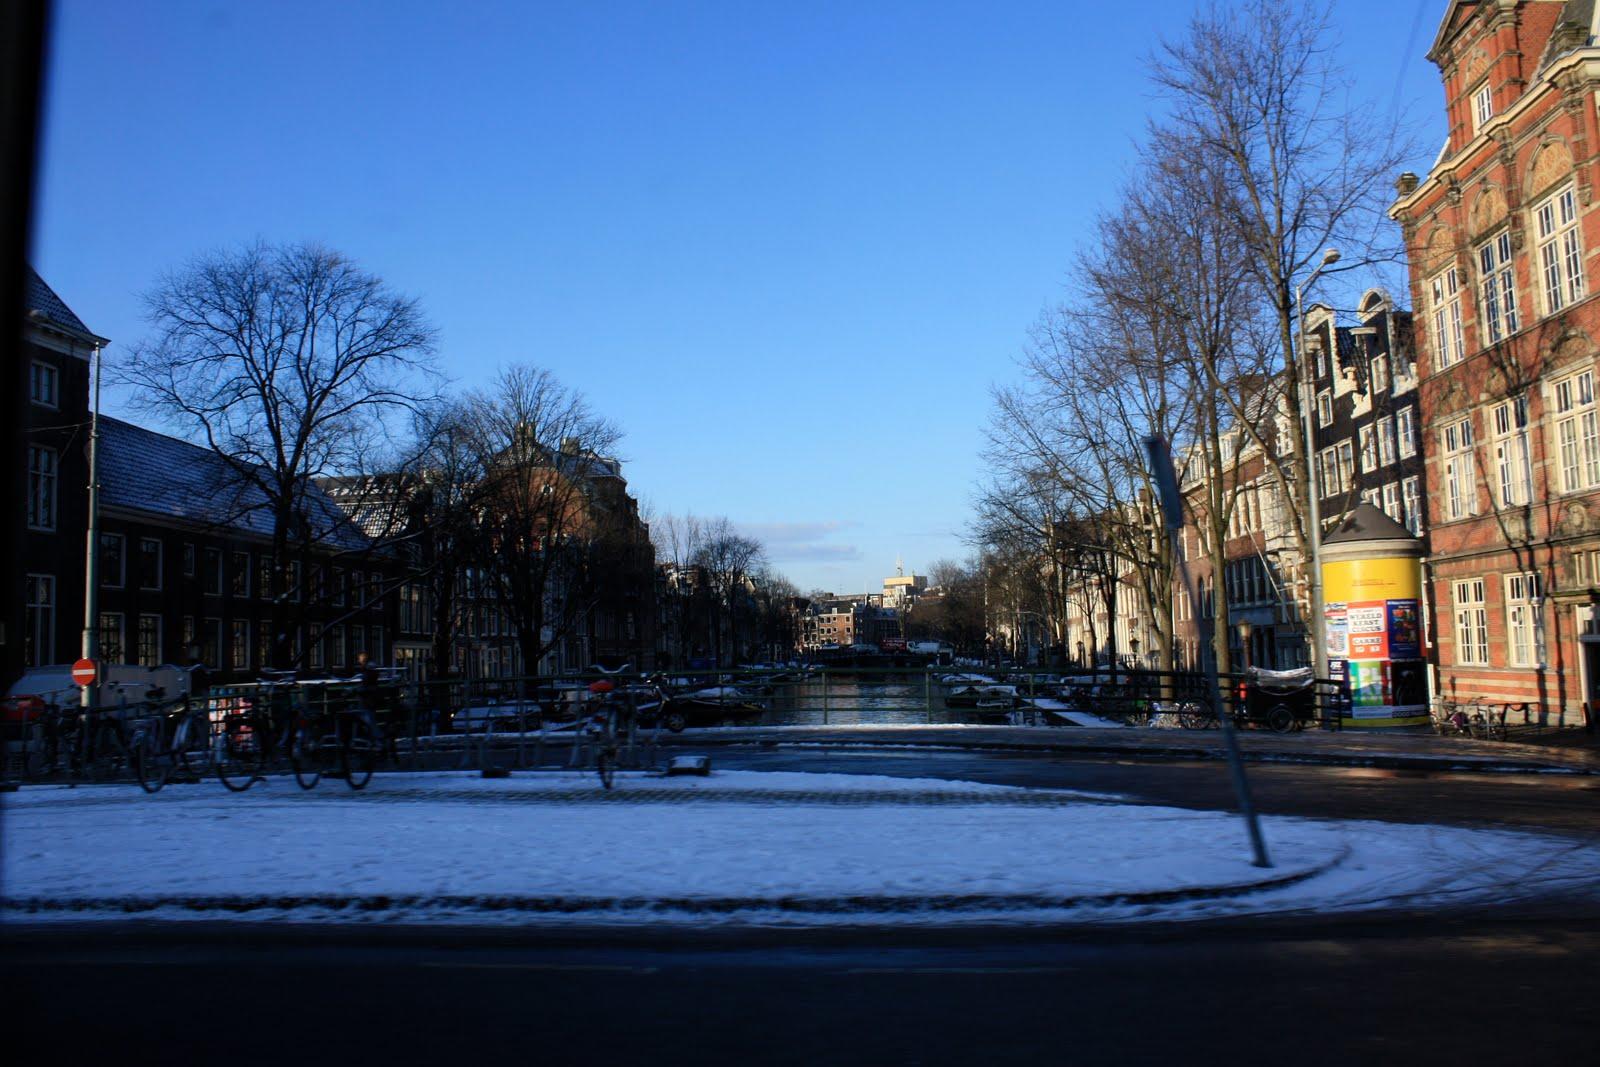 besneeuwde gracht - snowy canal